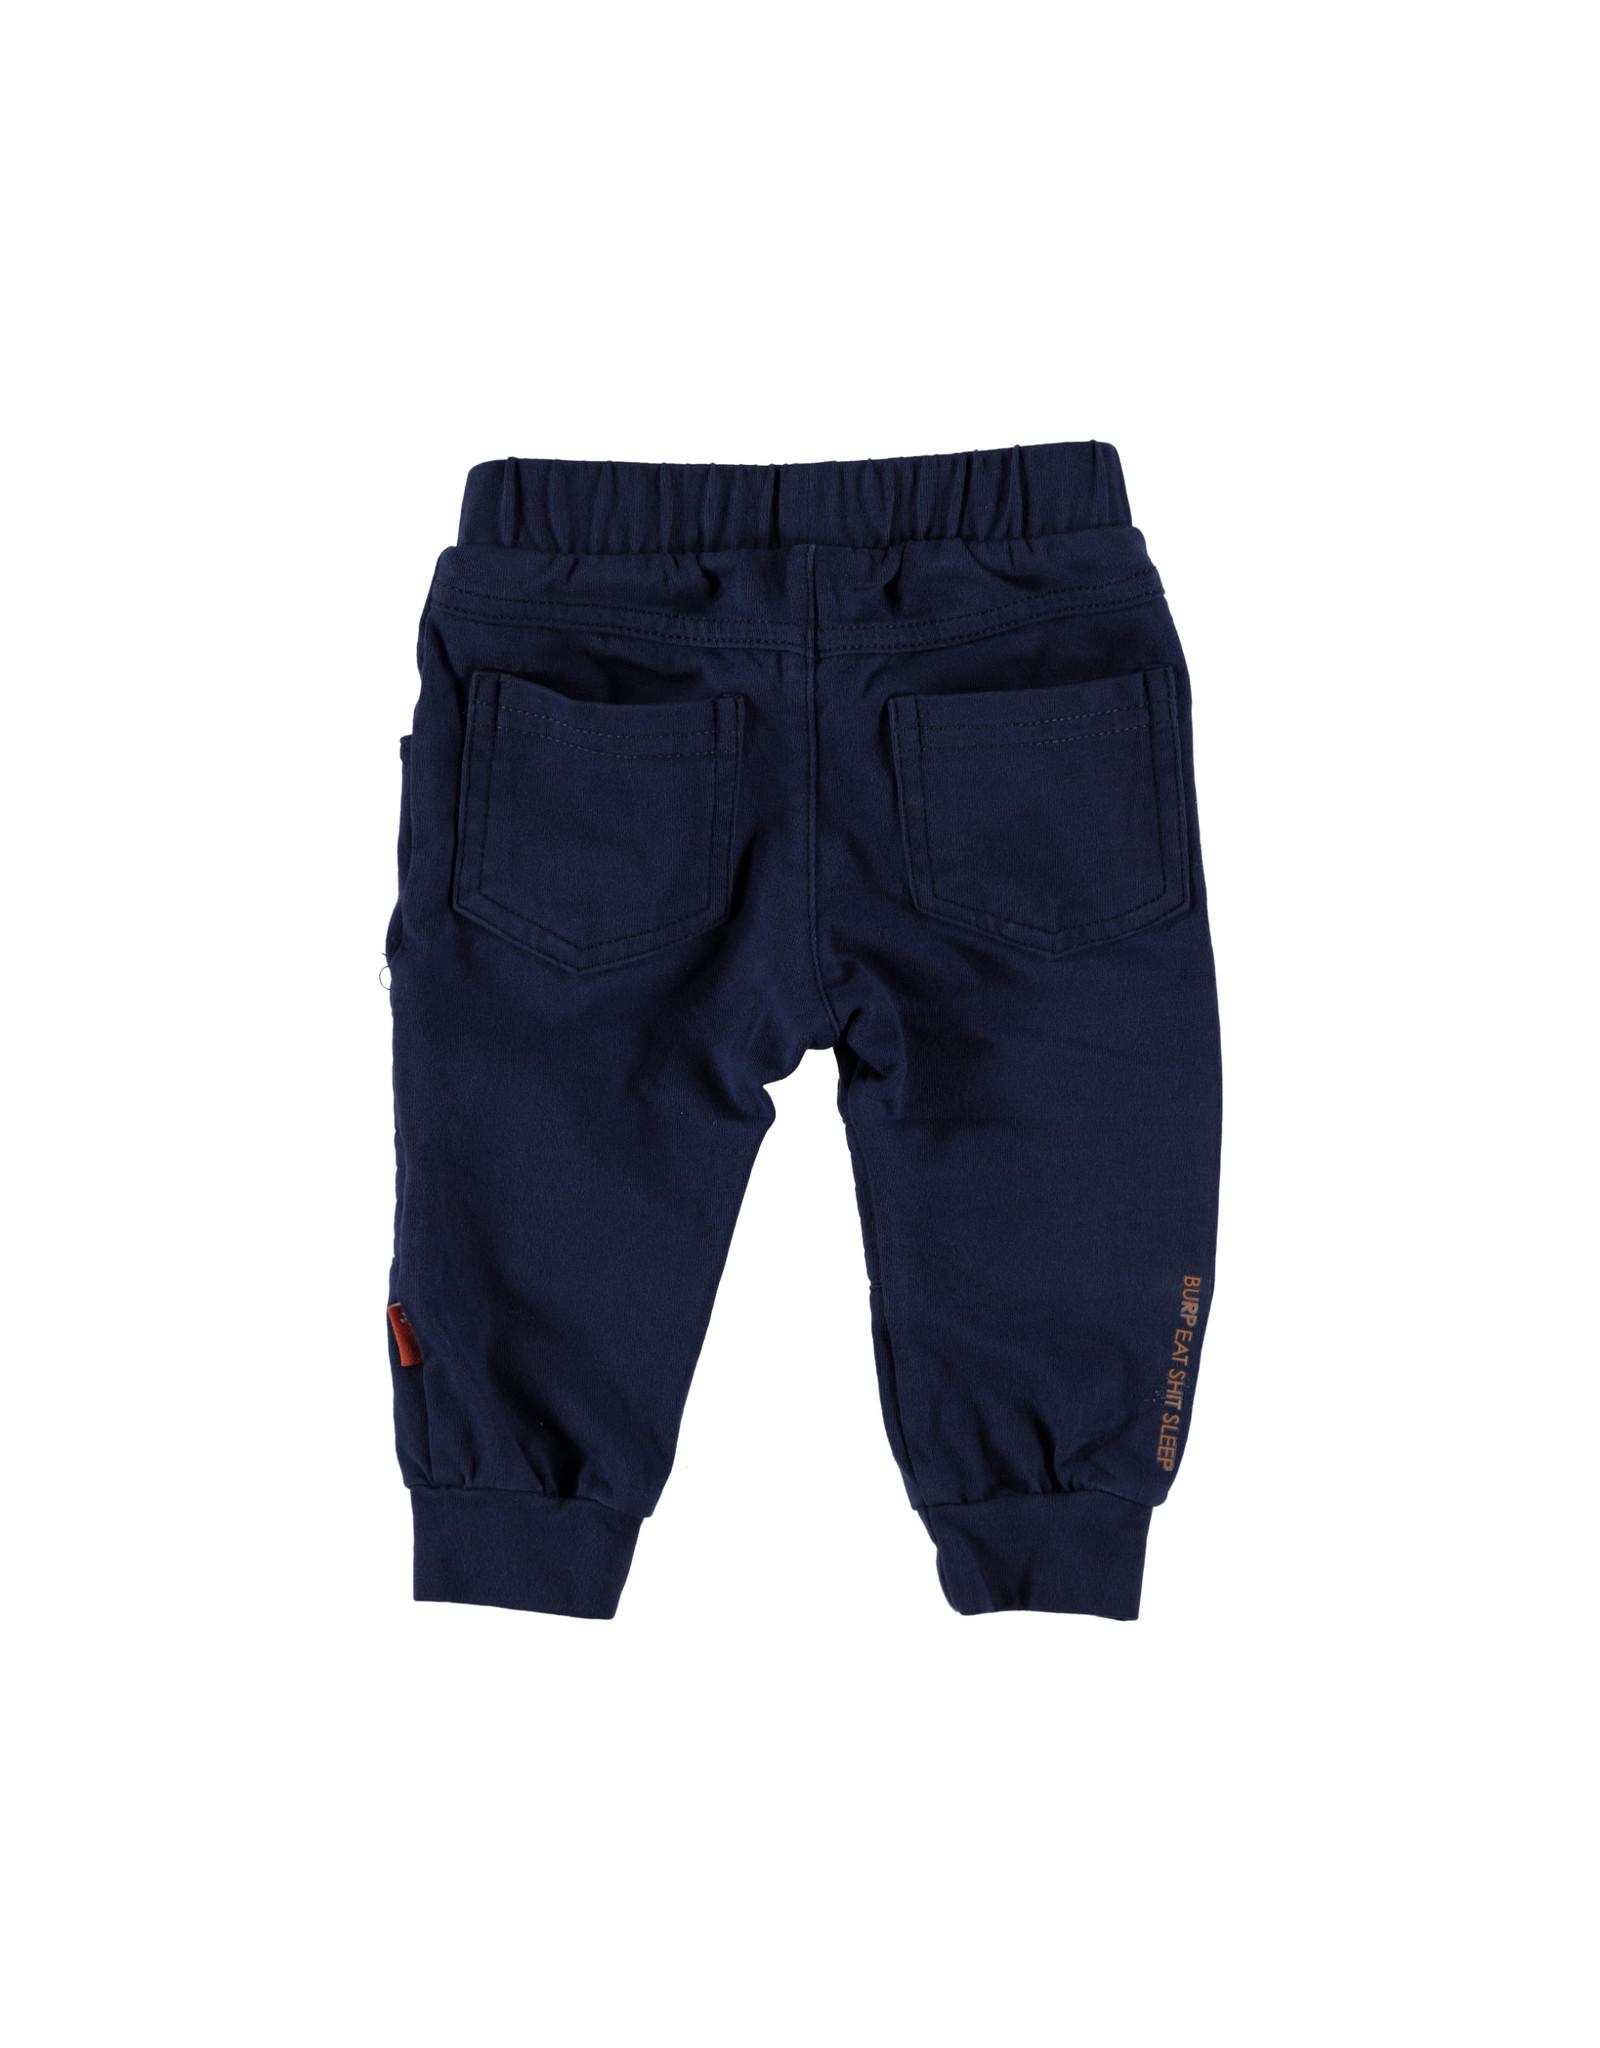 B.E.S.S. Pants Biker, Blue